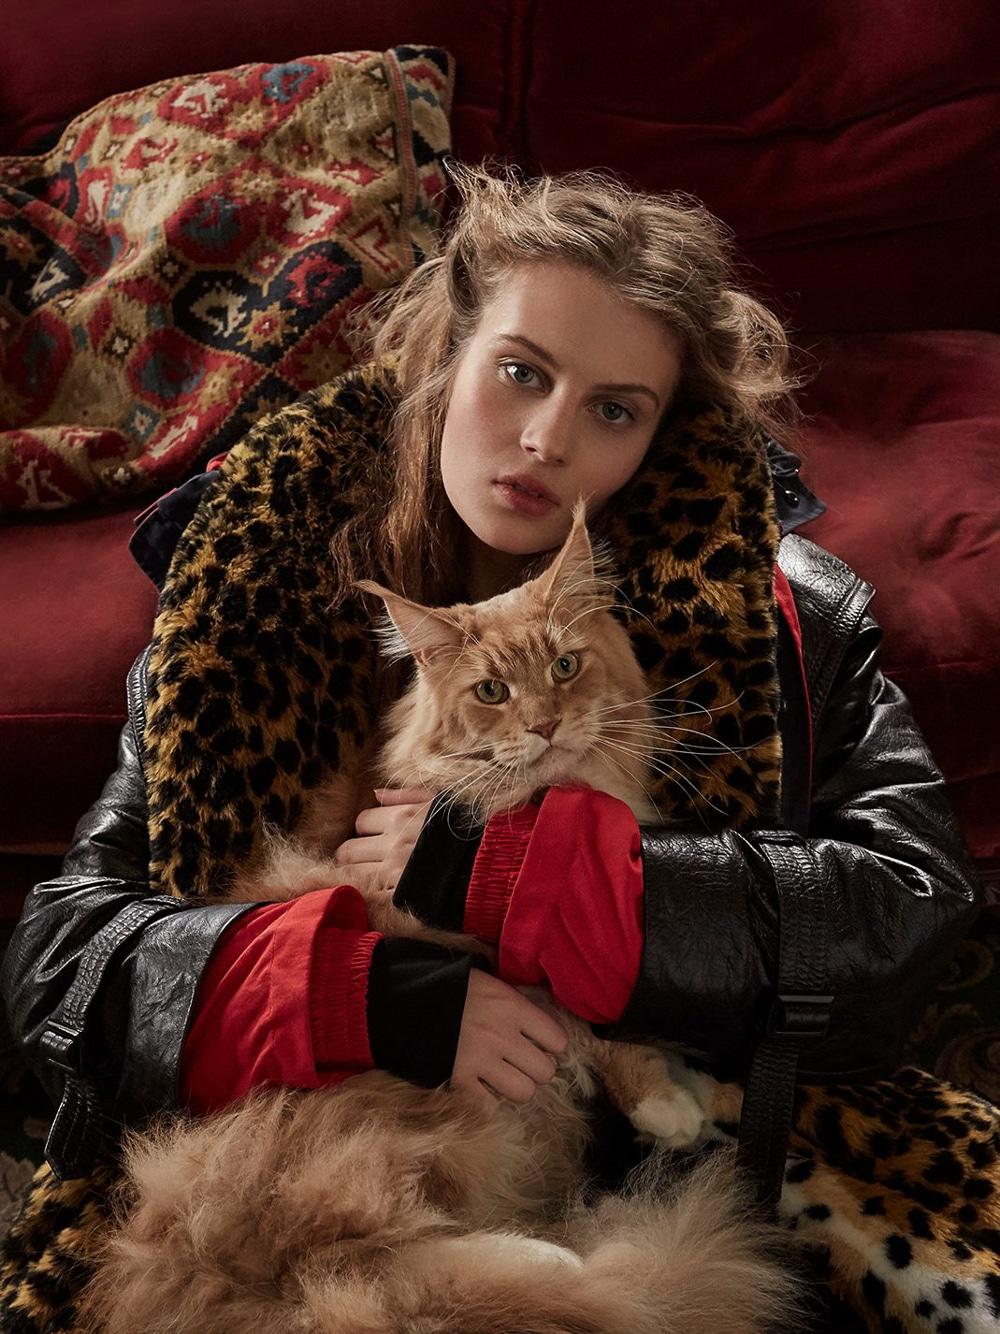 Harpers-Bazaar-UK-Septamber-2018-Florence-Kosky-Agata-Pospieszynska-2.jpg